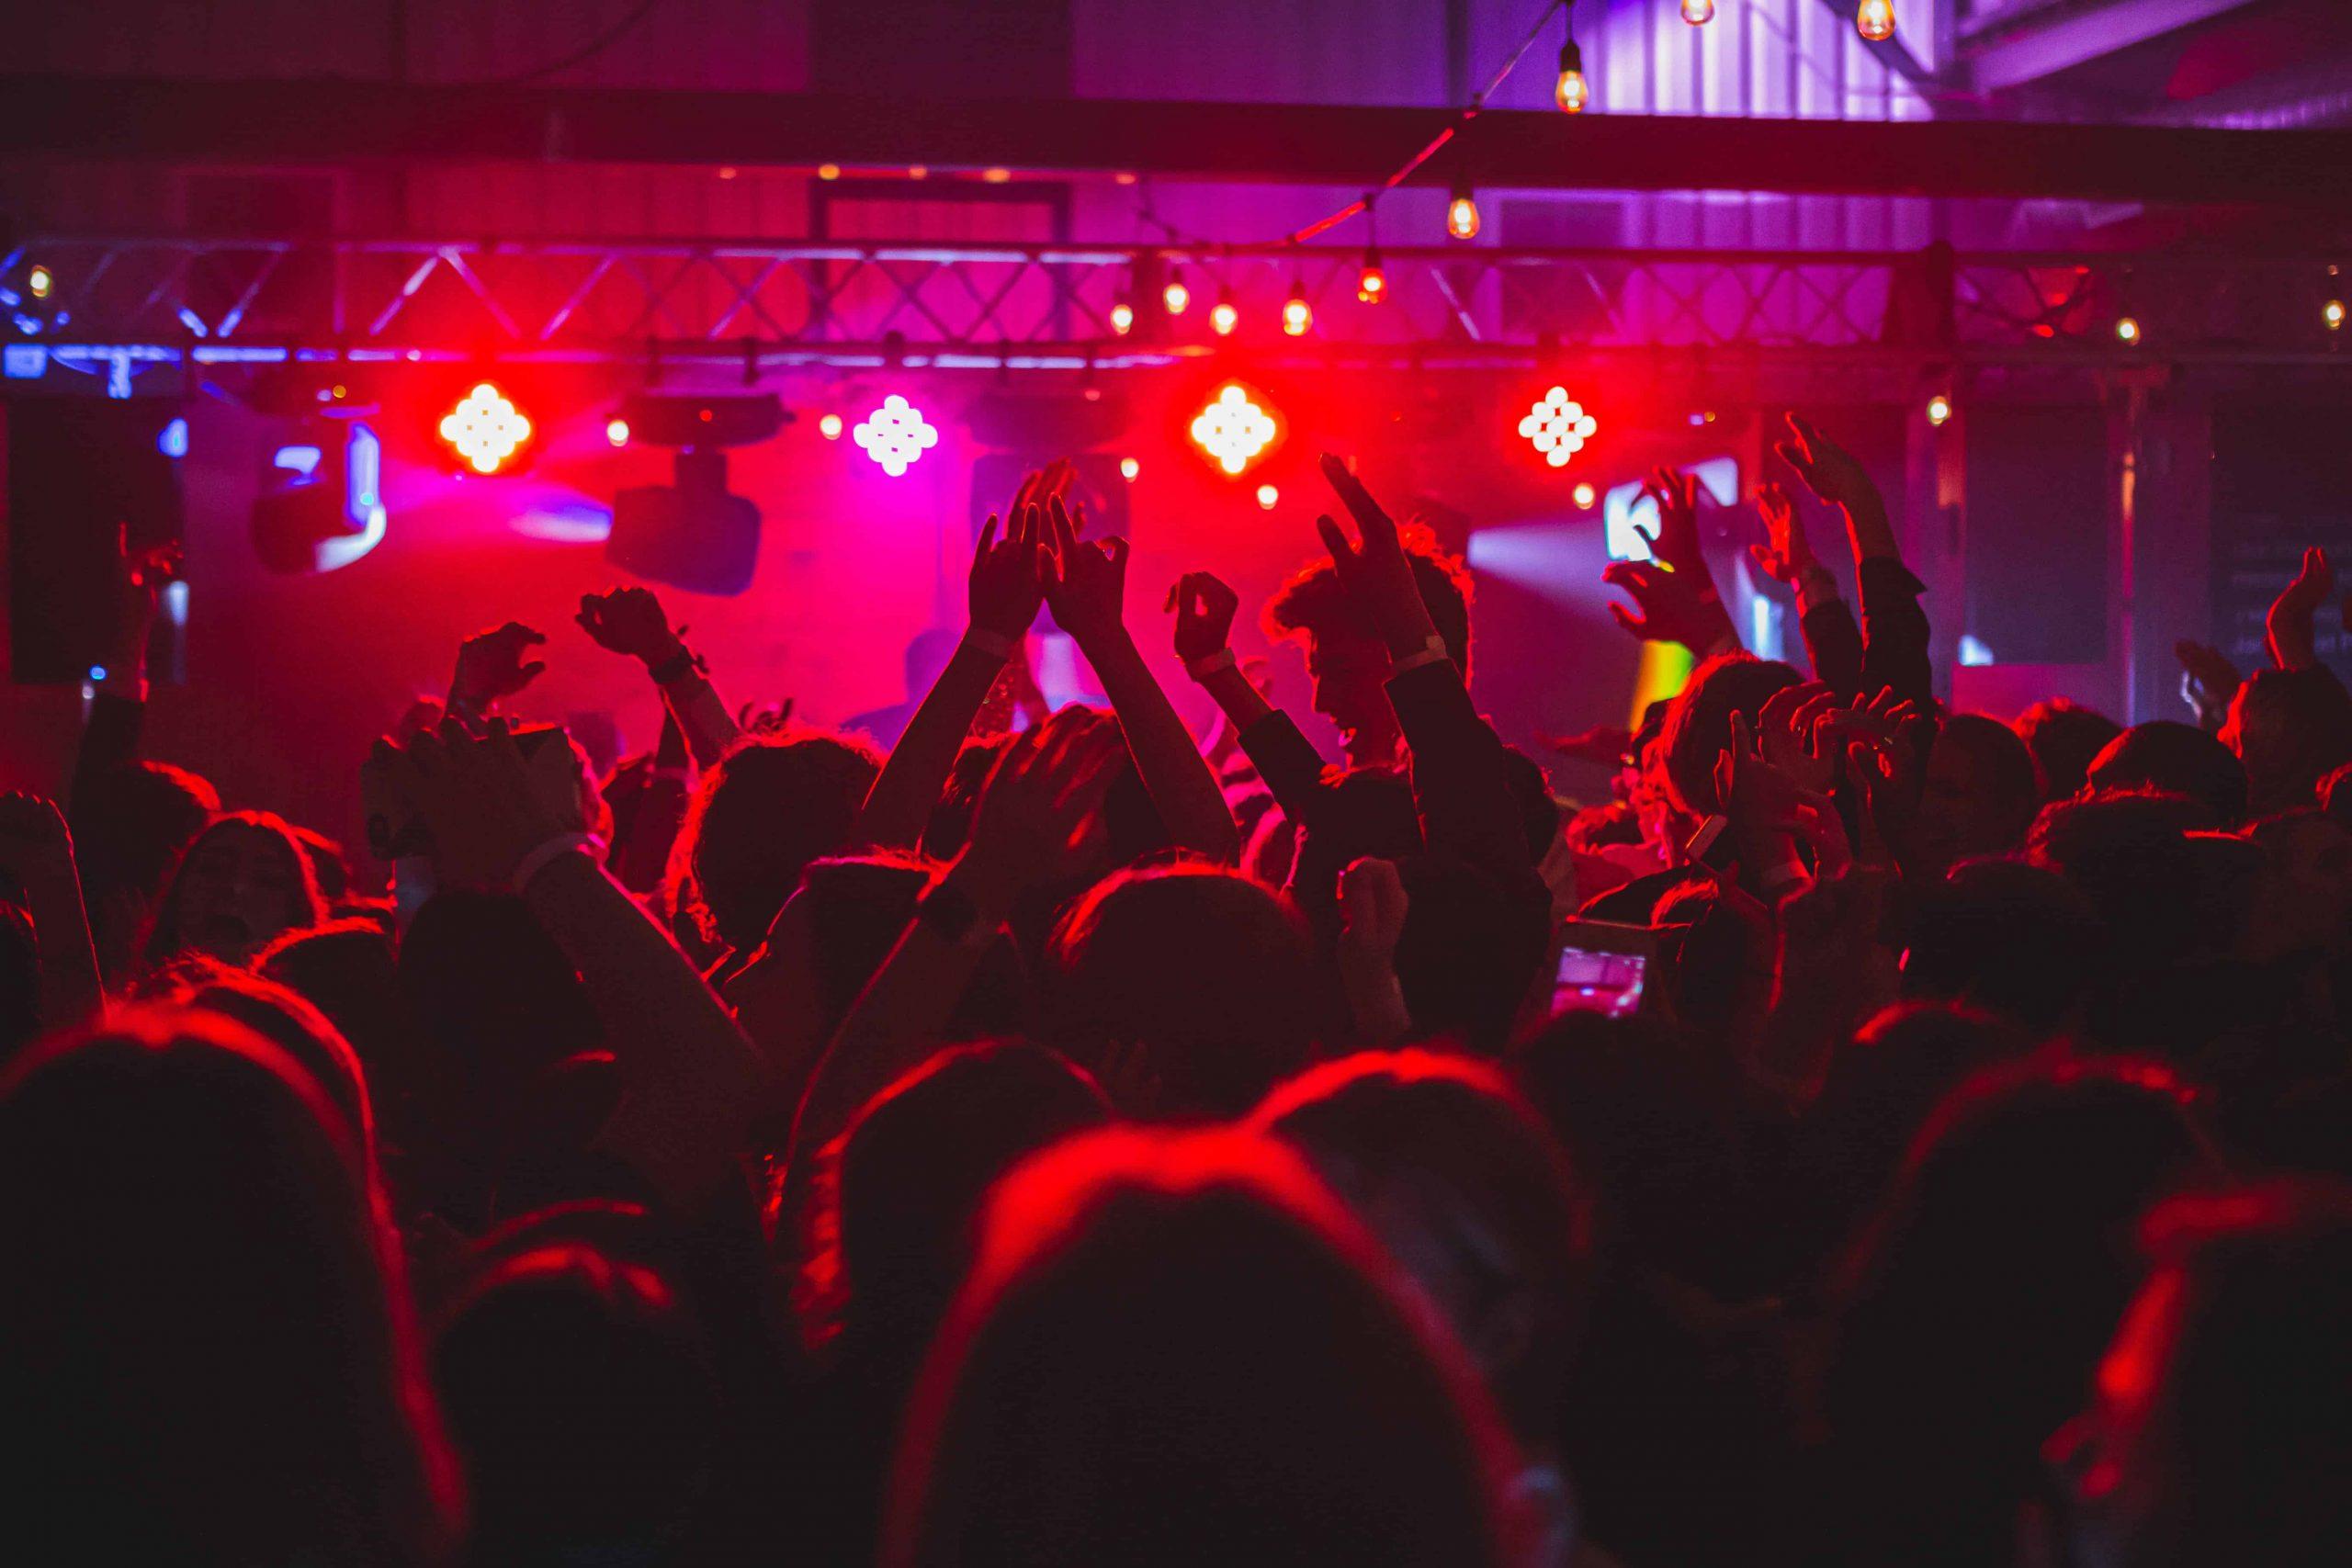 Nightclub crowd red light Long Truong